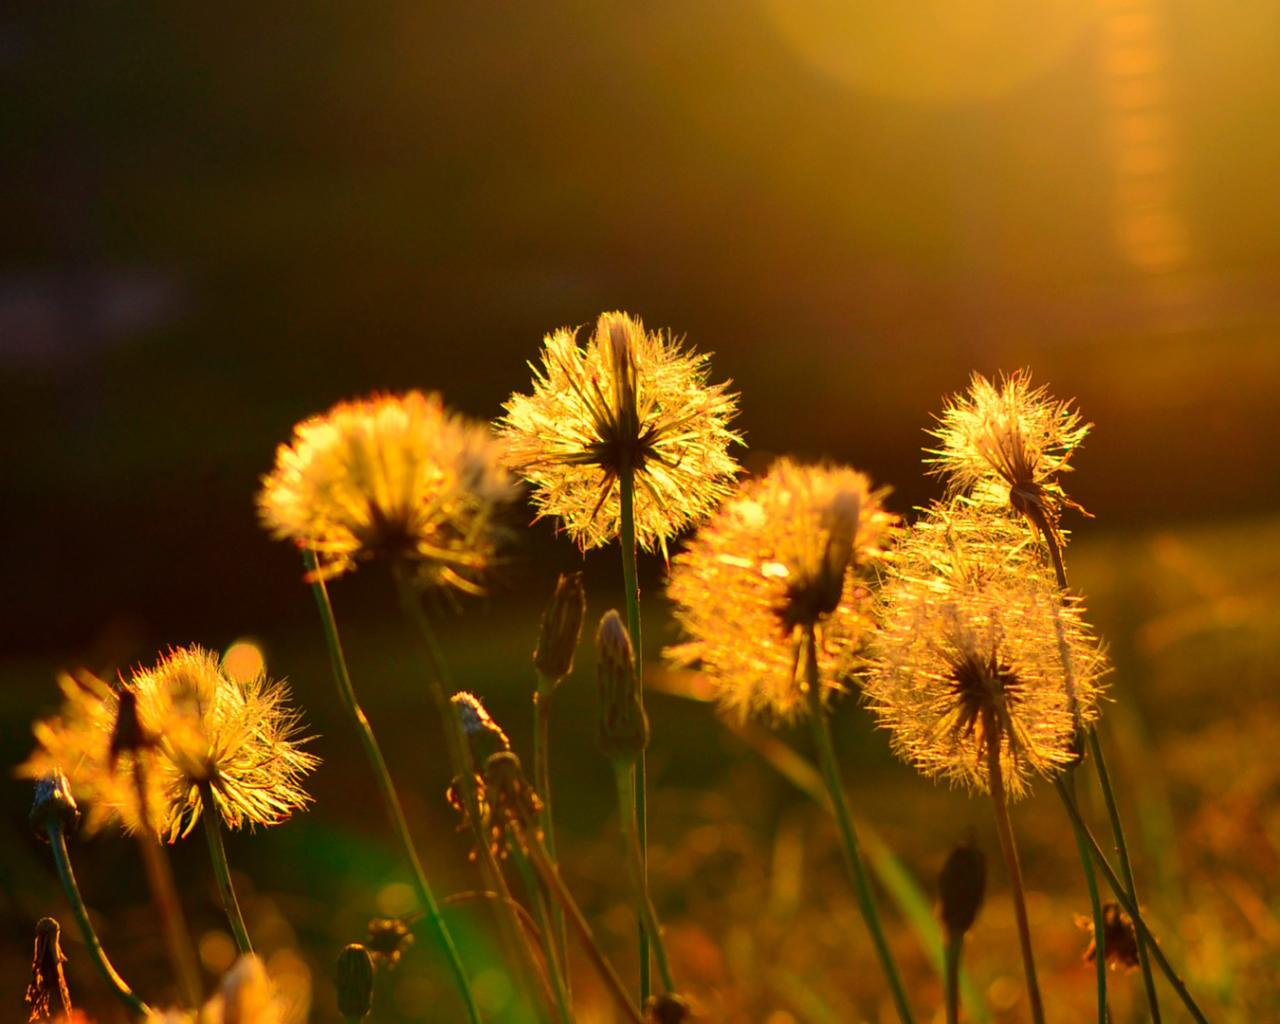 Лето солнце жара цветы макро